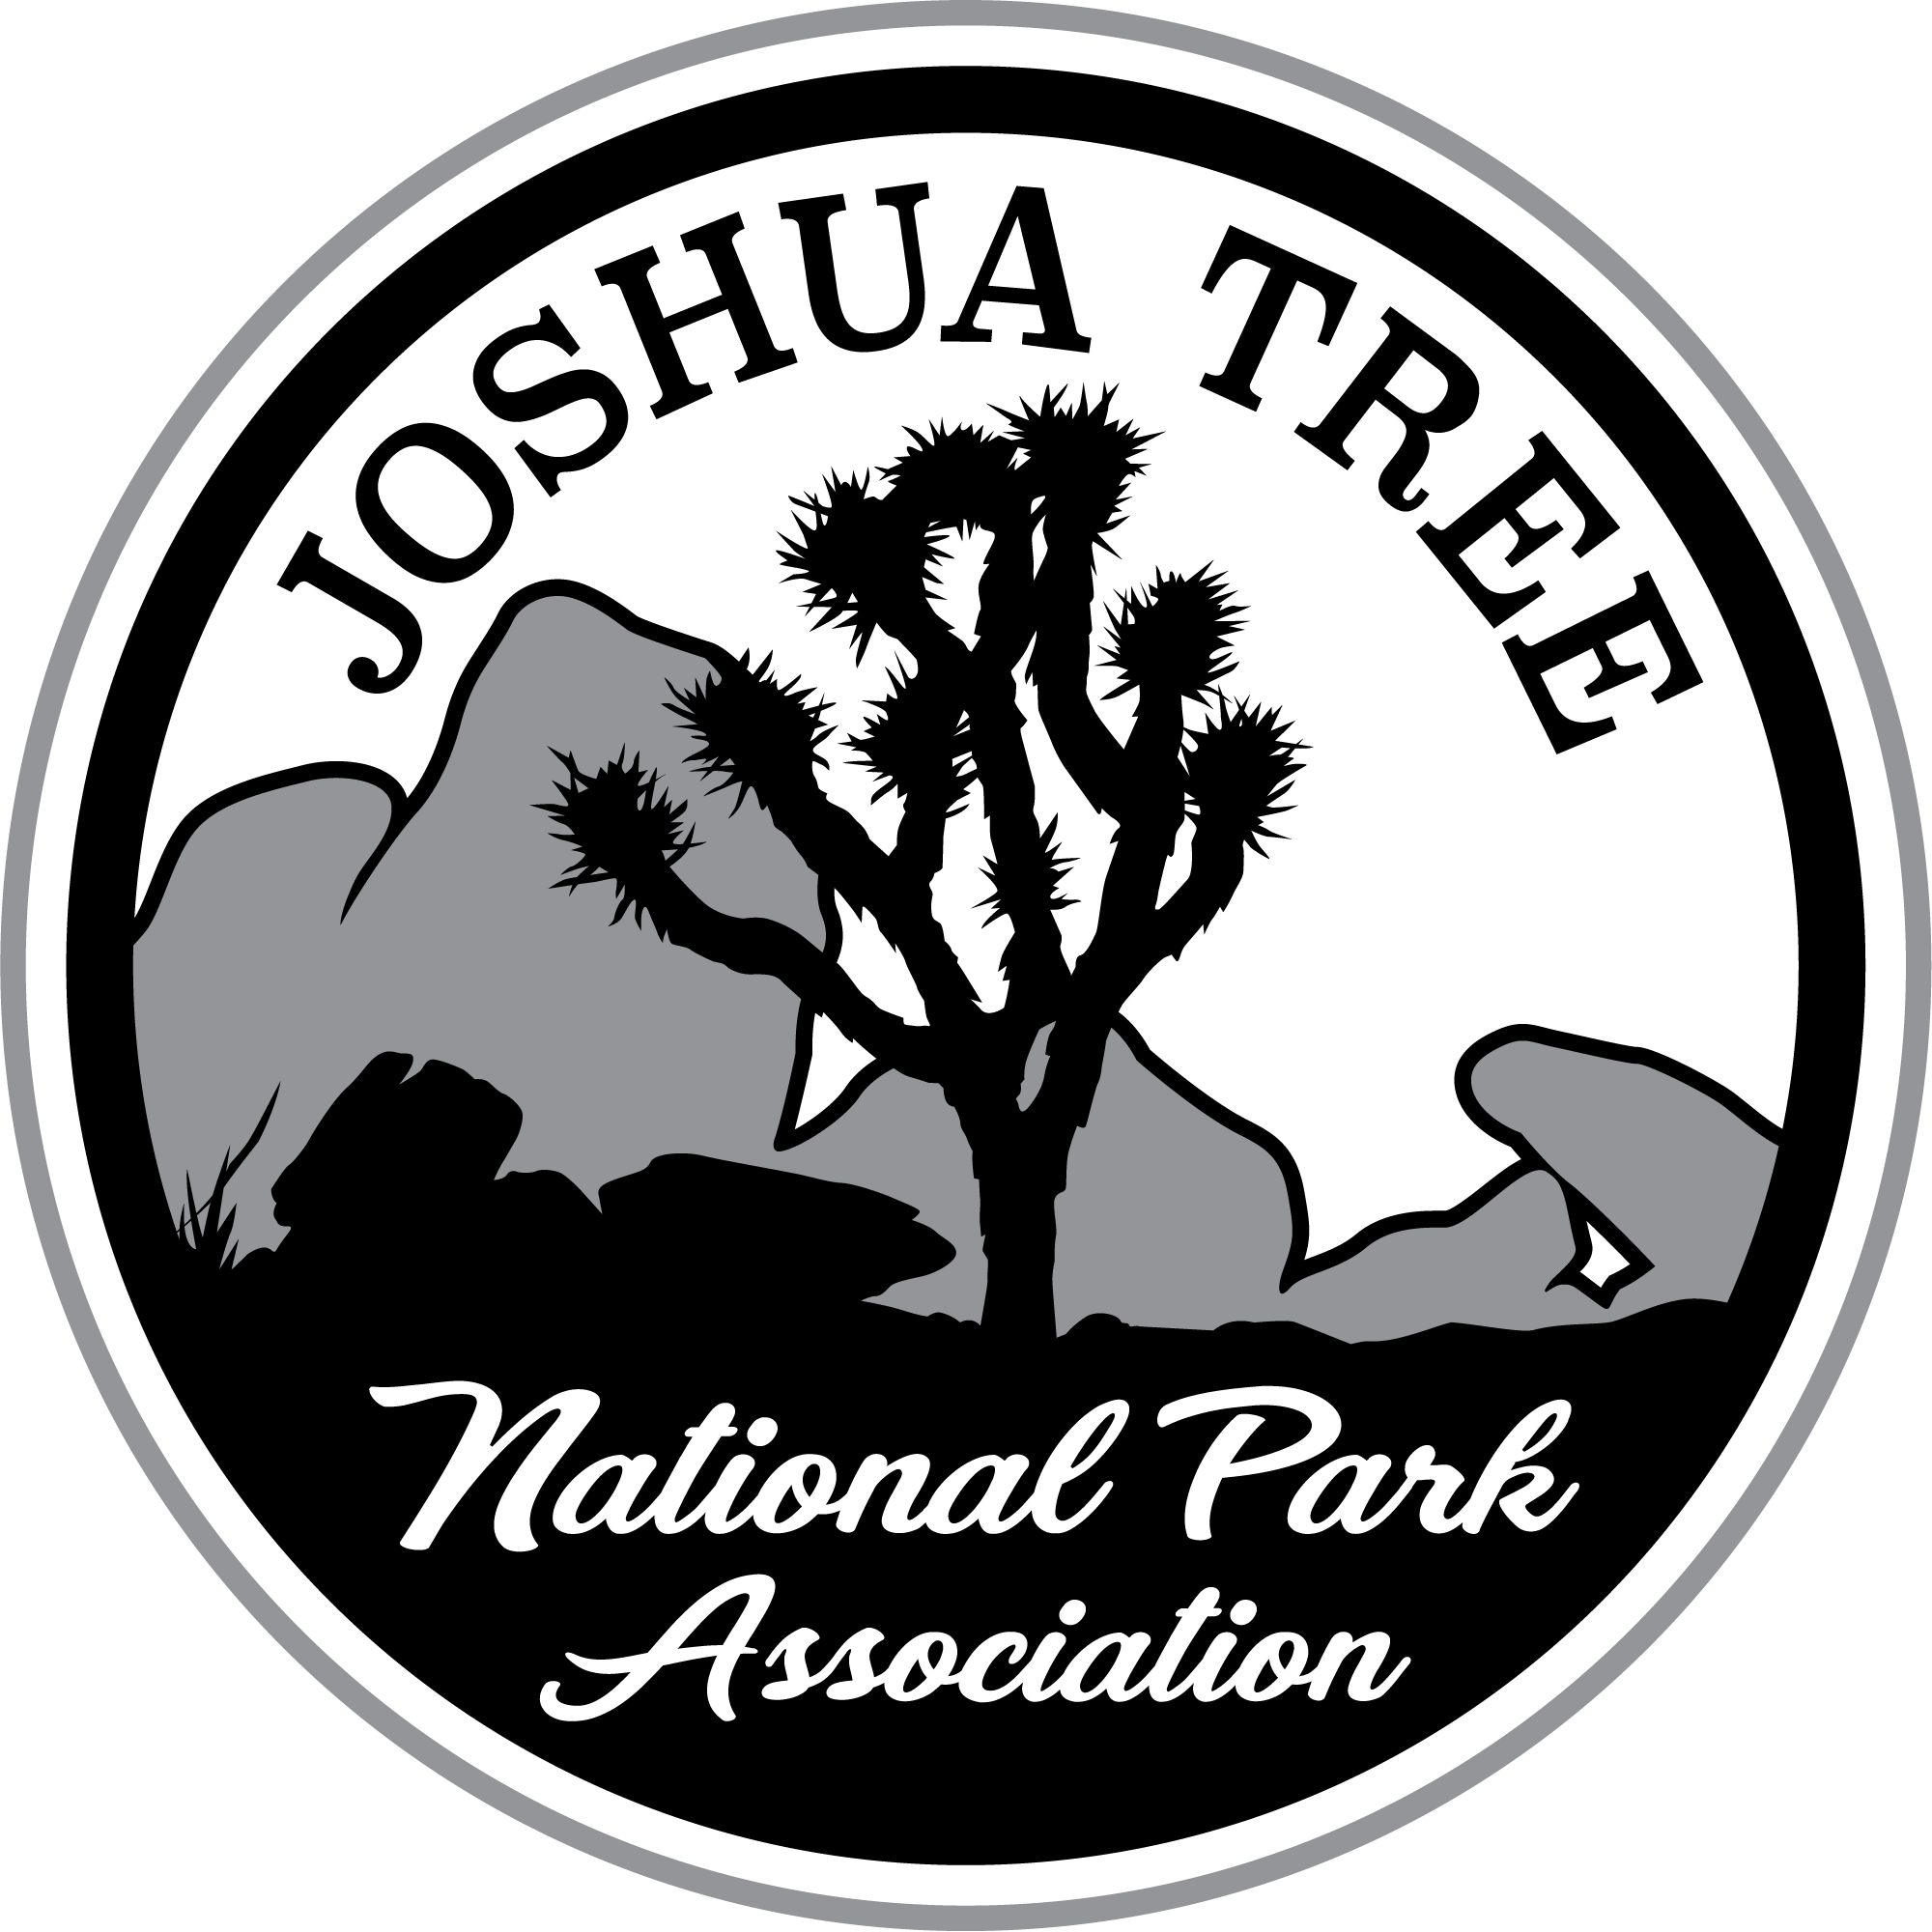 Joshua tree national park clipart jpg library stock Media Kit   News   Joshua Tree National Park Association jpg library stock